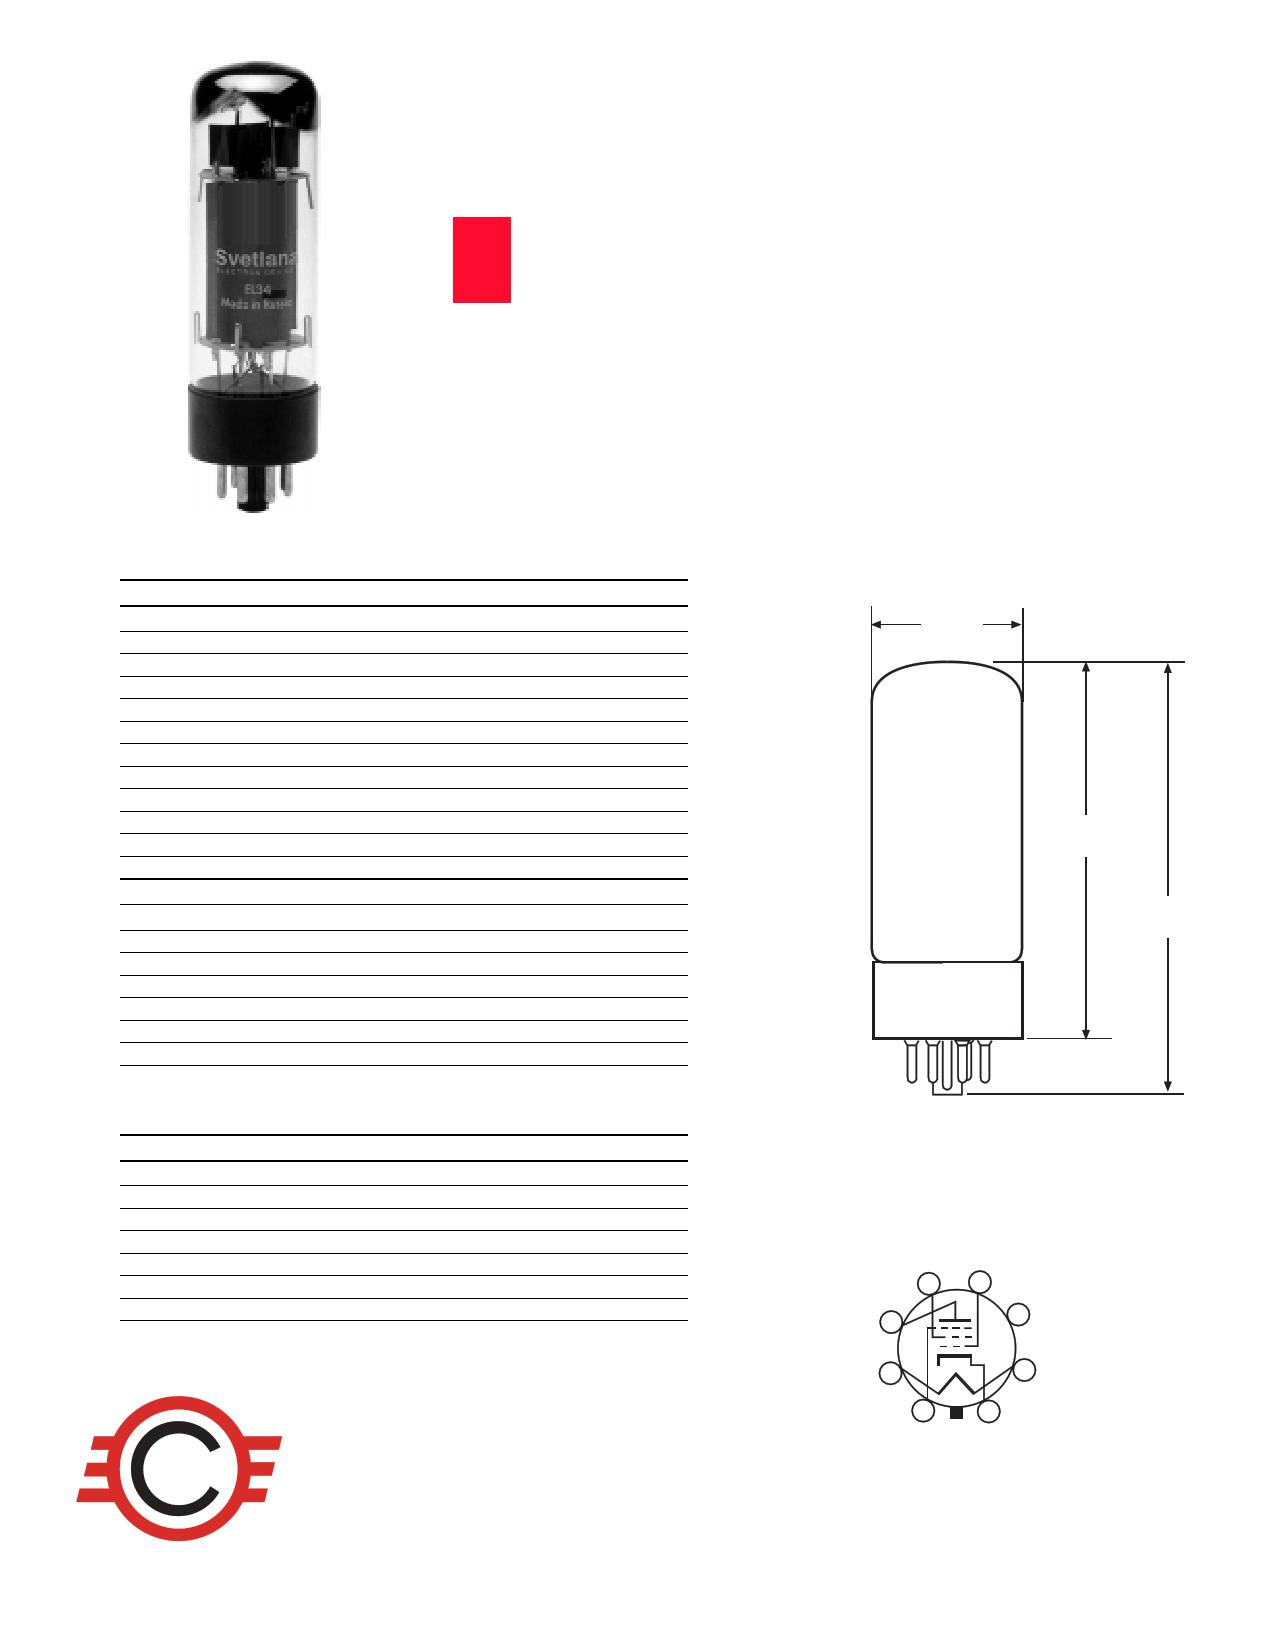 6CA7 Datasheet, 6CA7 PDF,ピン配置, 機能